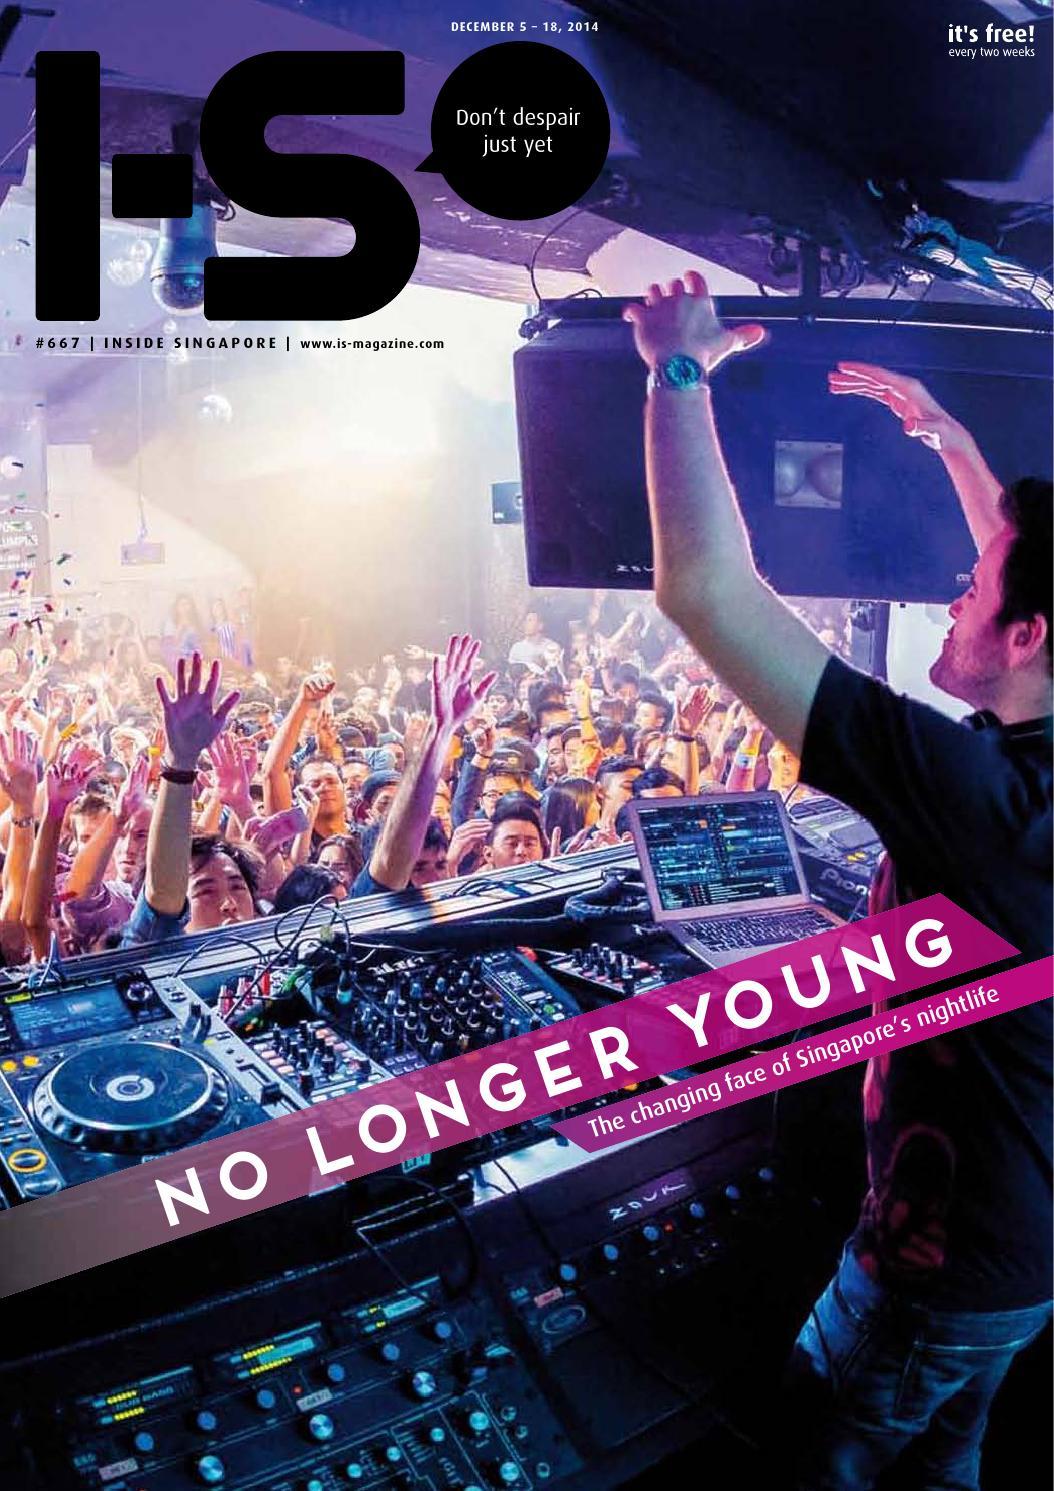 virtual Free nightclubs adult multiplayer online